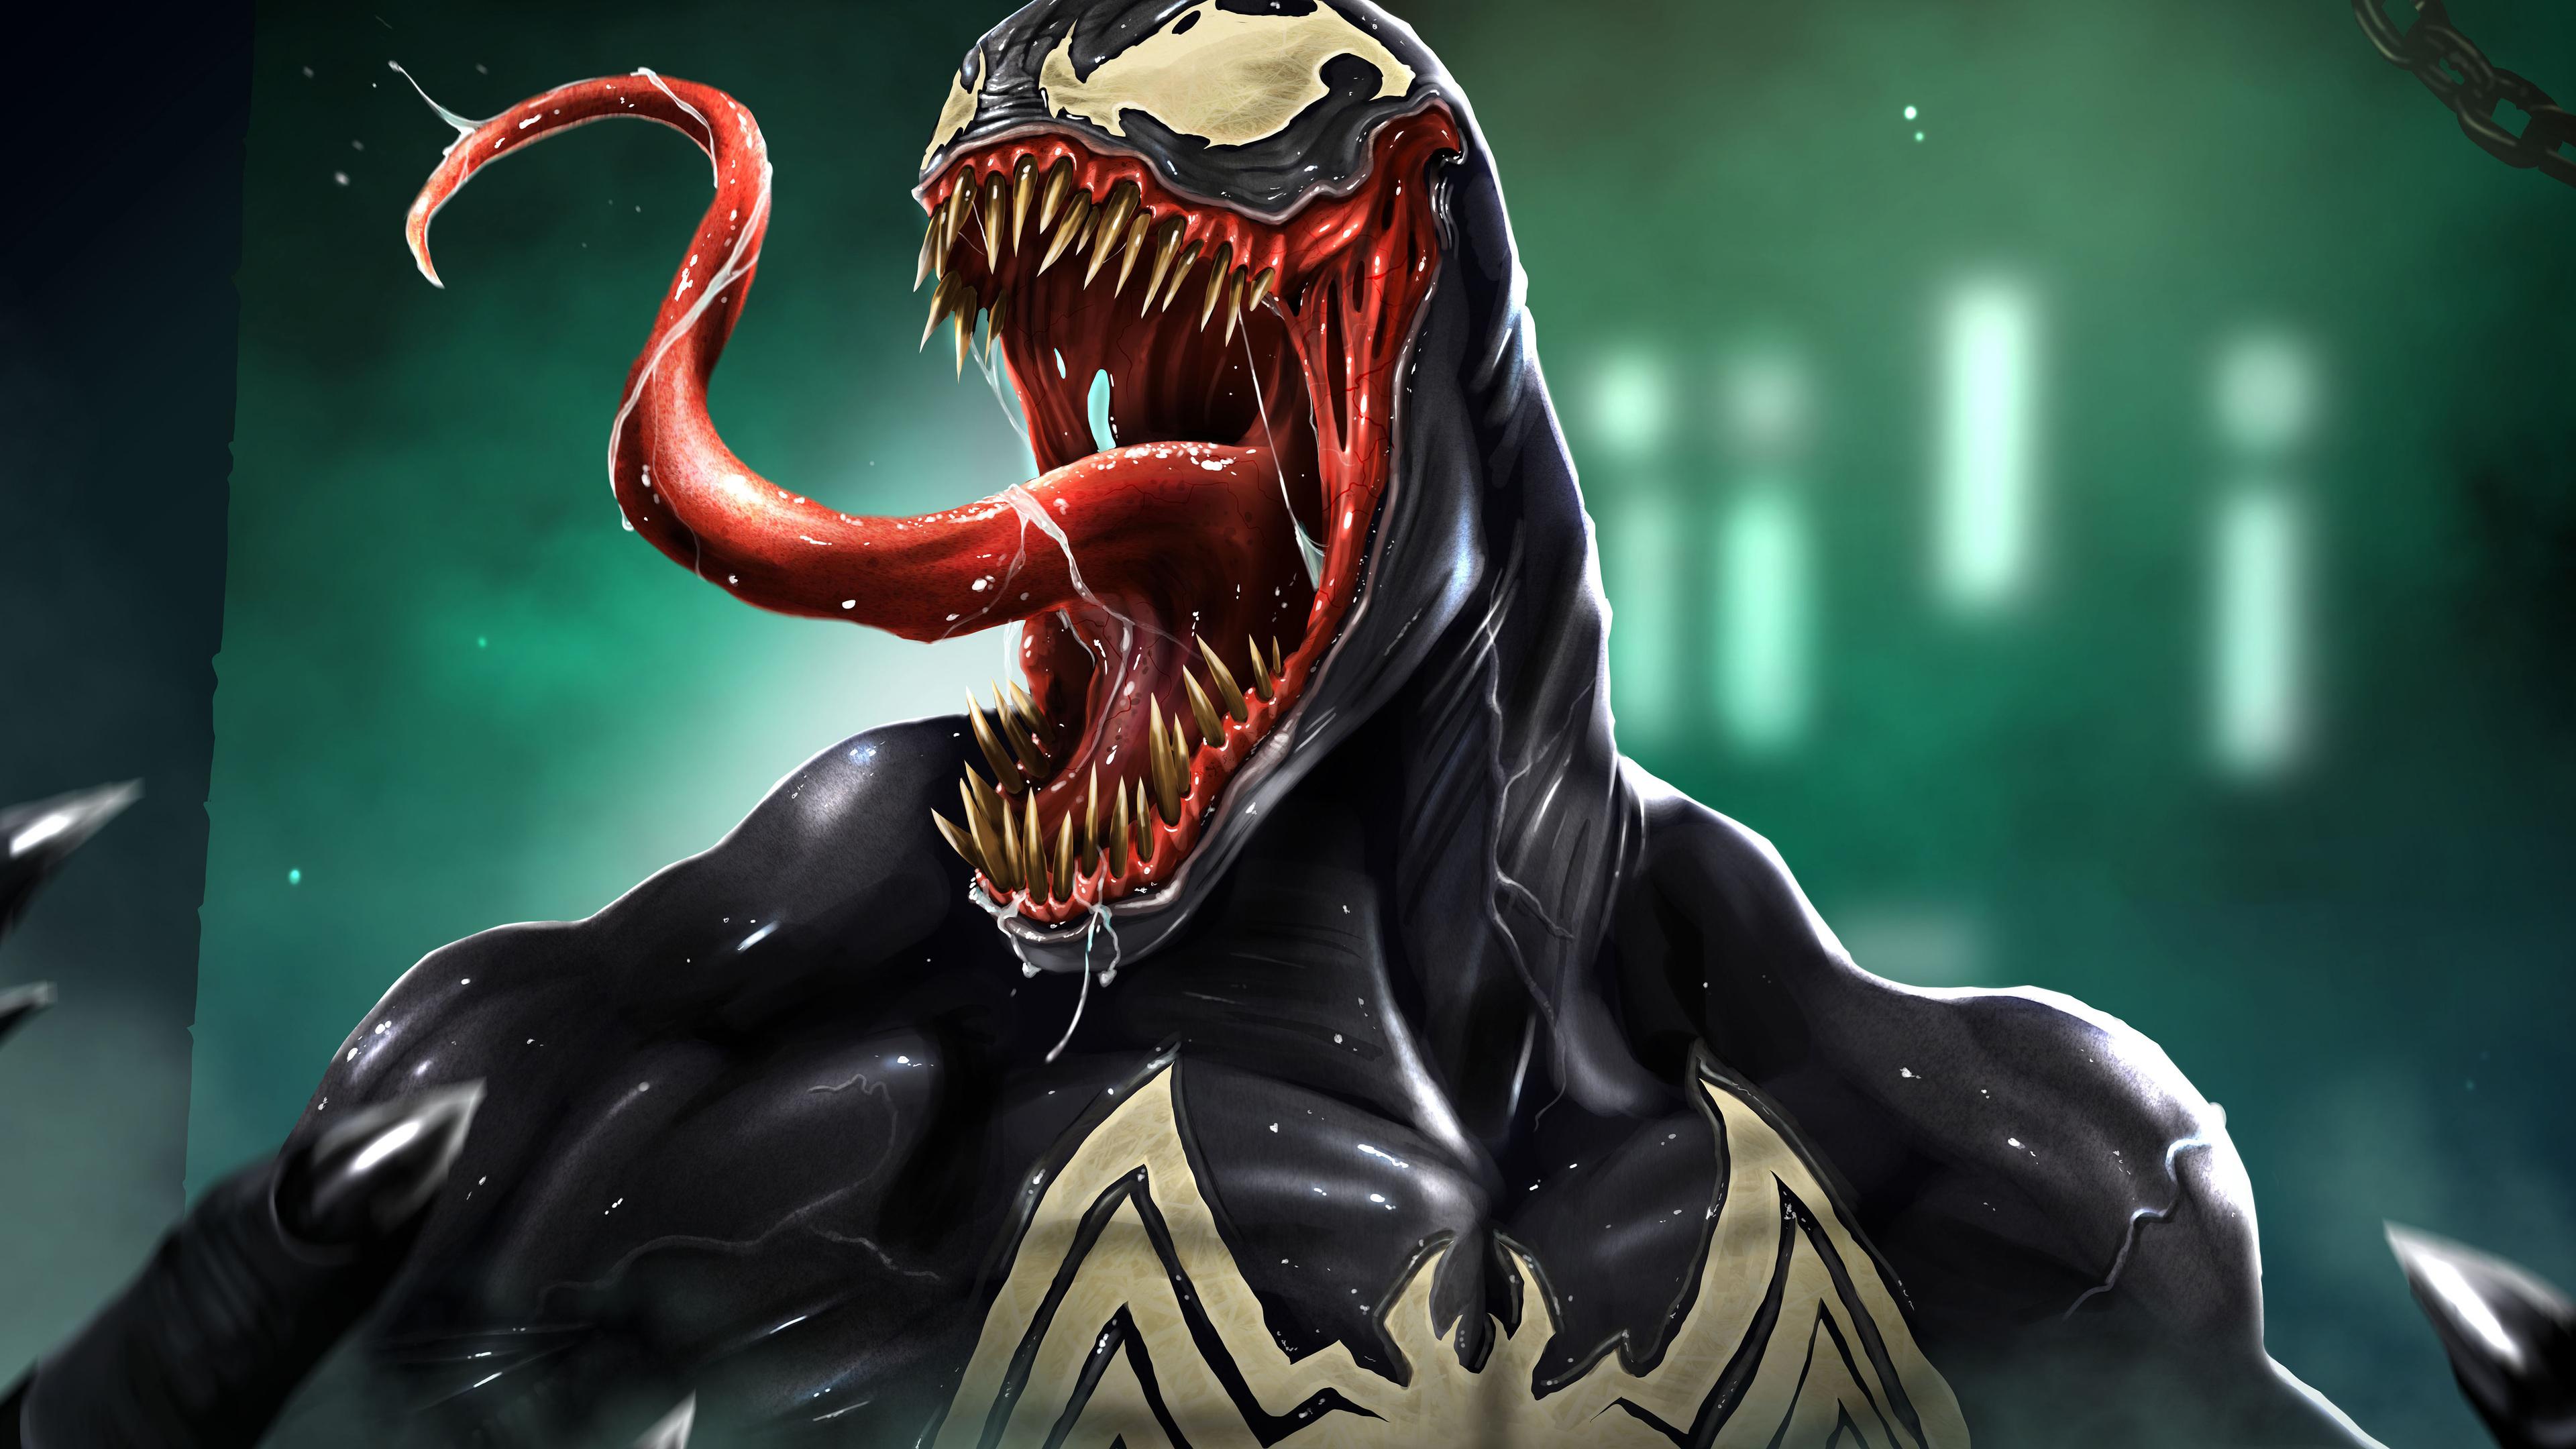 2048x2048 Venom 2018 Movie 4k Ipad Air Hd 4k Wallpapers: Venom Pop Culture Art Venom Wallpapers, Hd-wallpapers